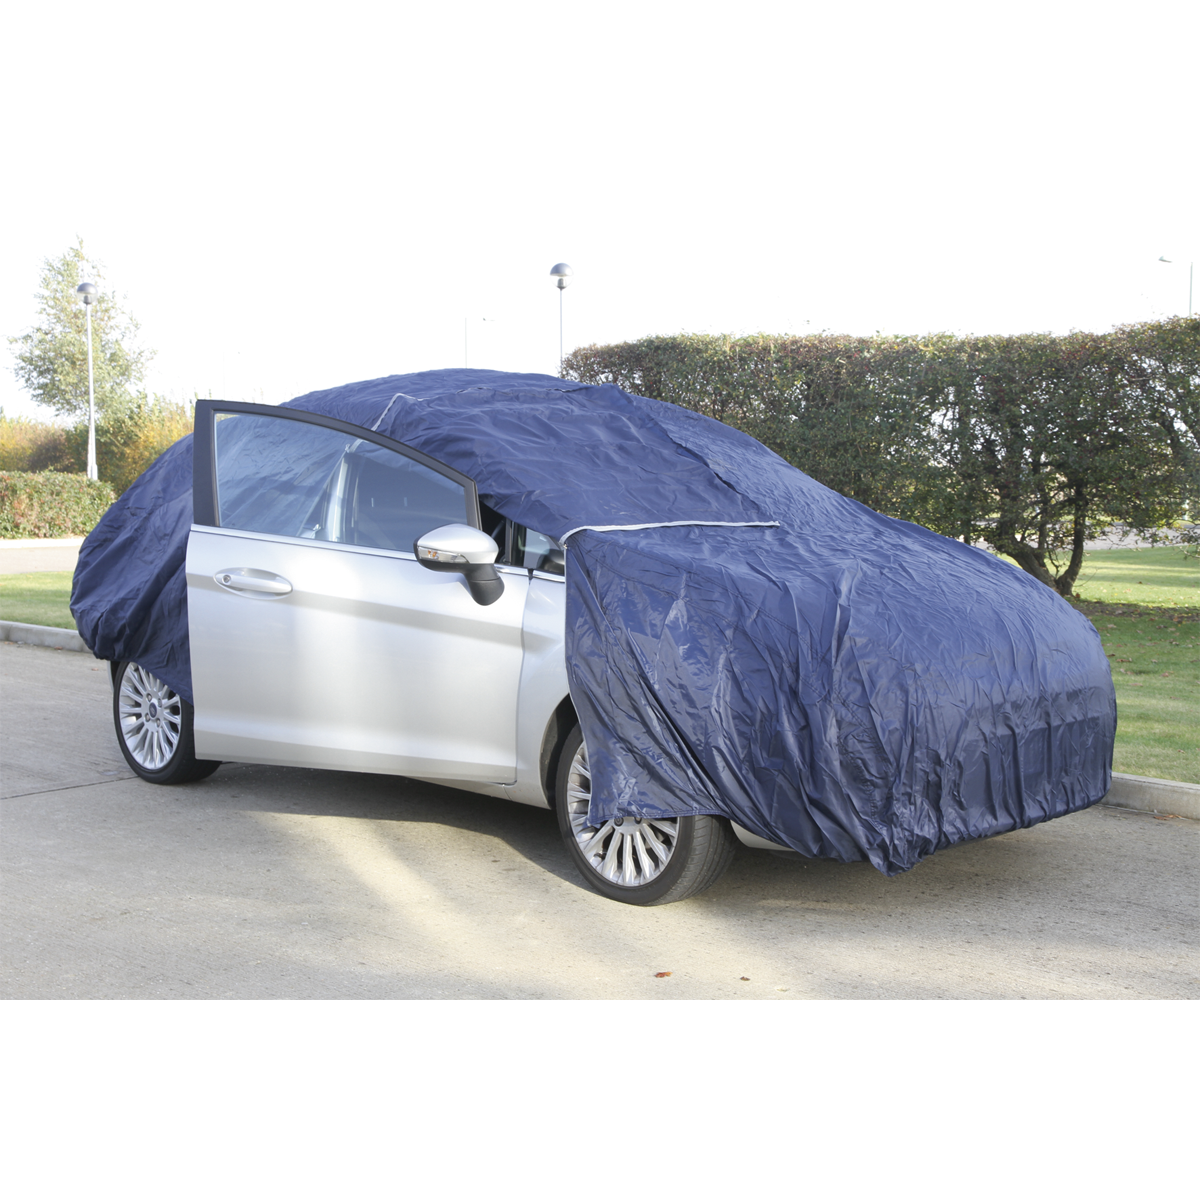 Car Cover Lightweight Small 3800 x 1540 x 1190mm